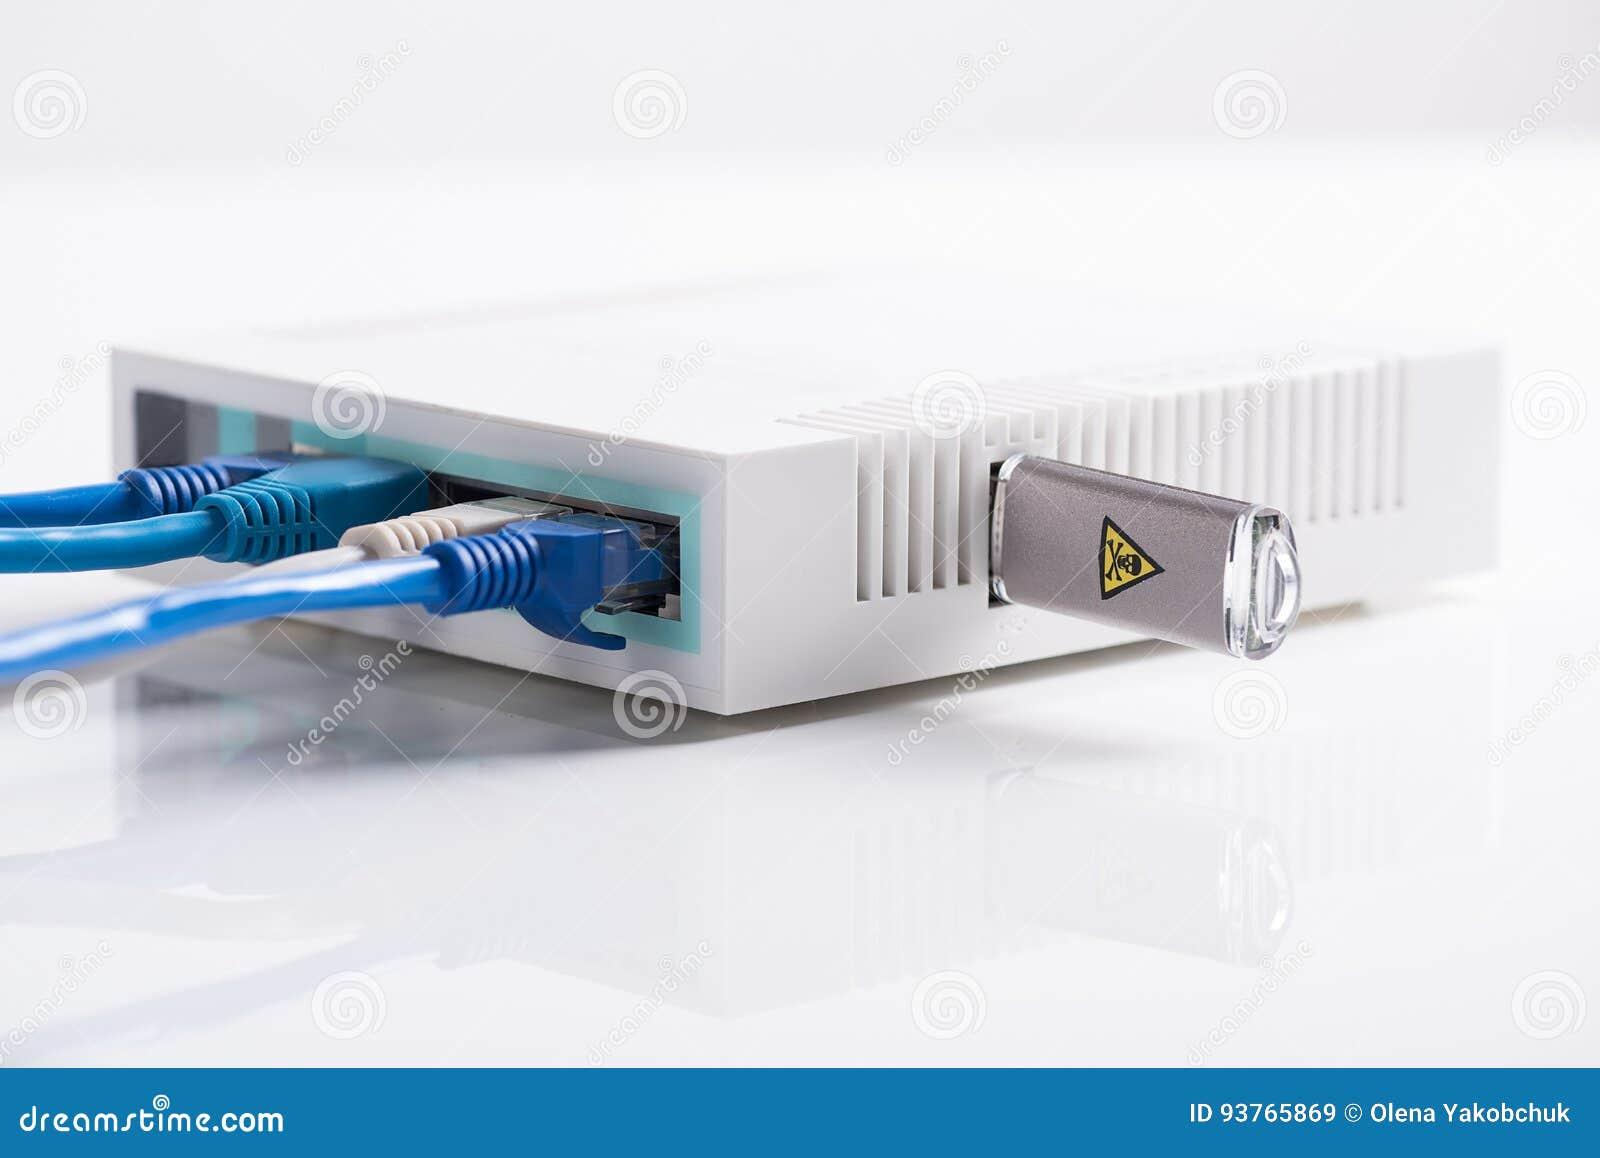 chiavetta usb internet